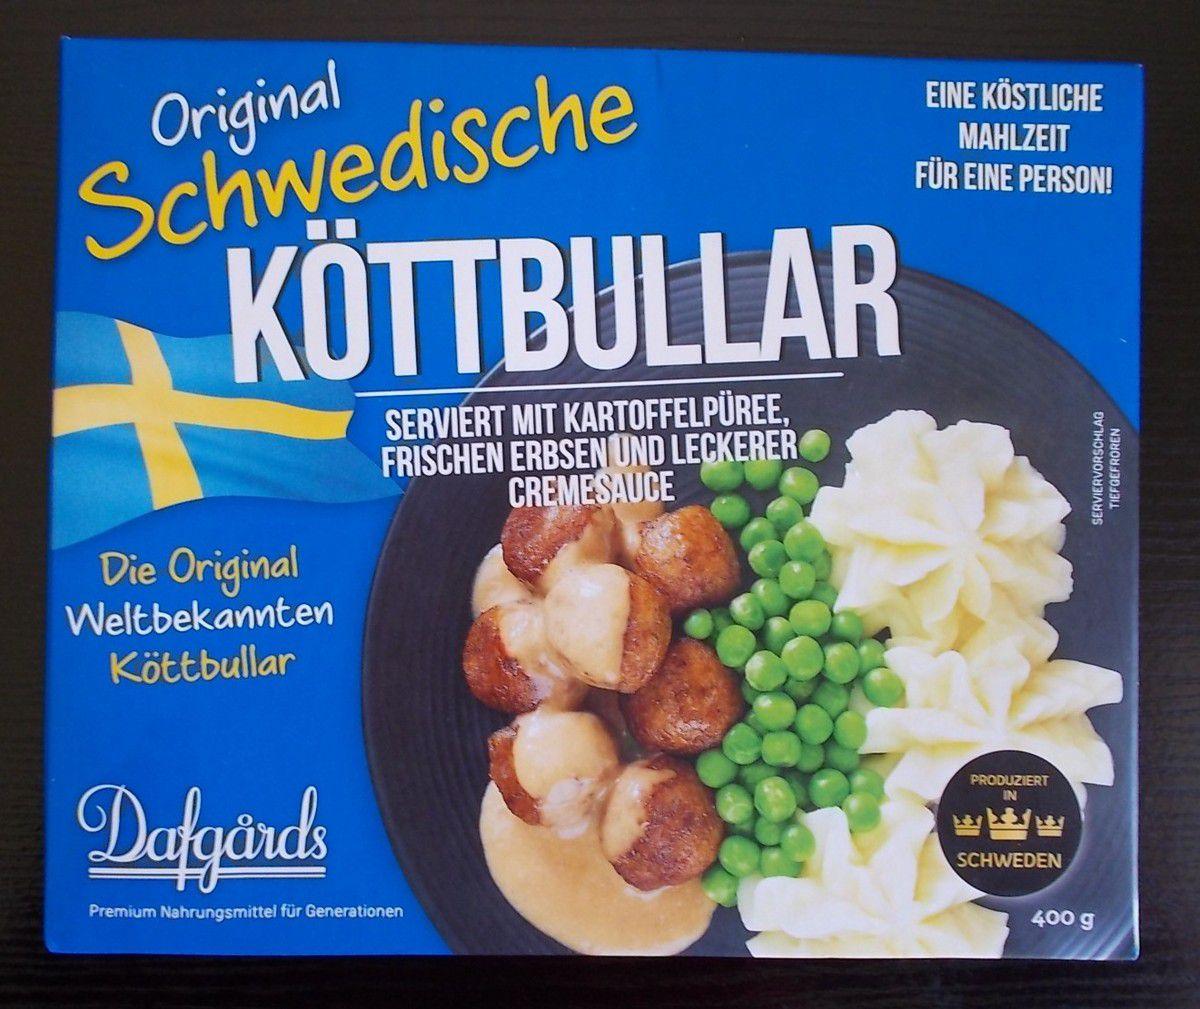 Dafgards Original Schwedische Köttbullar Menü